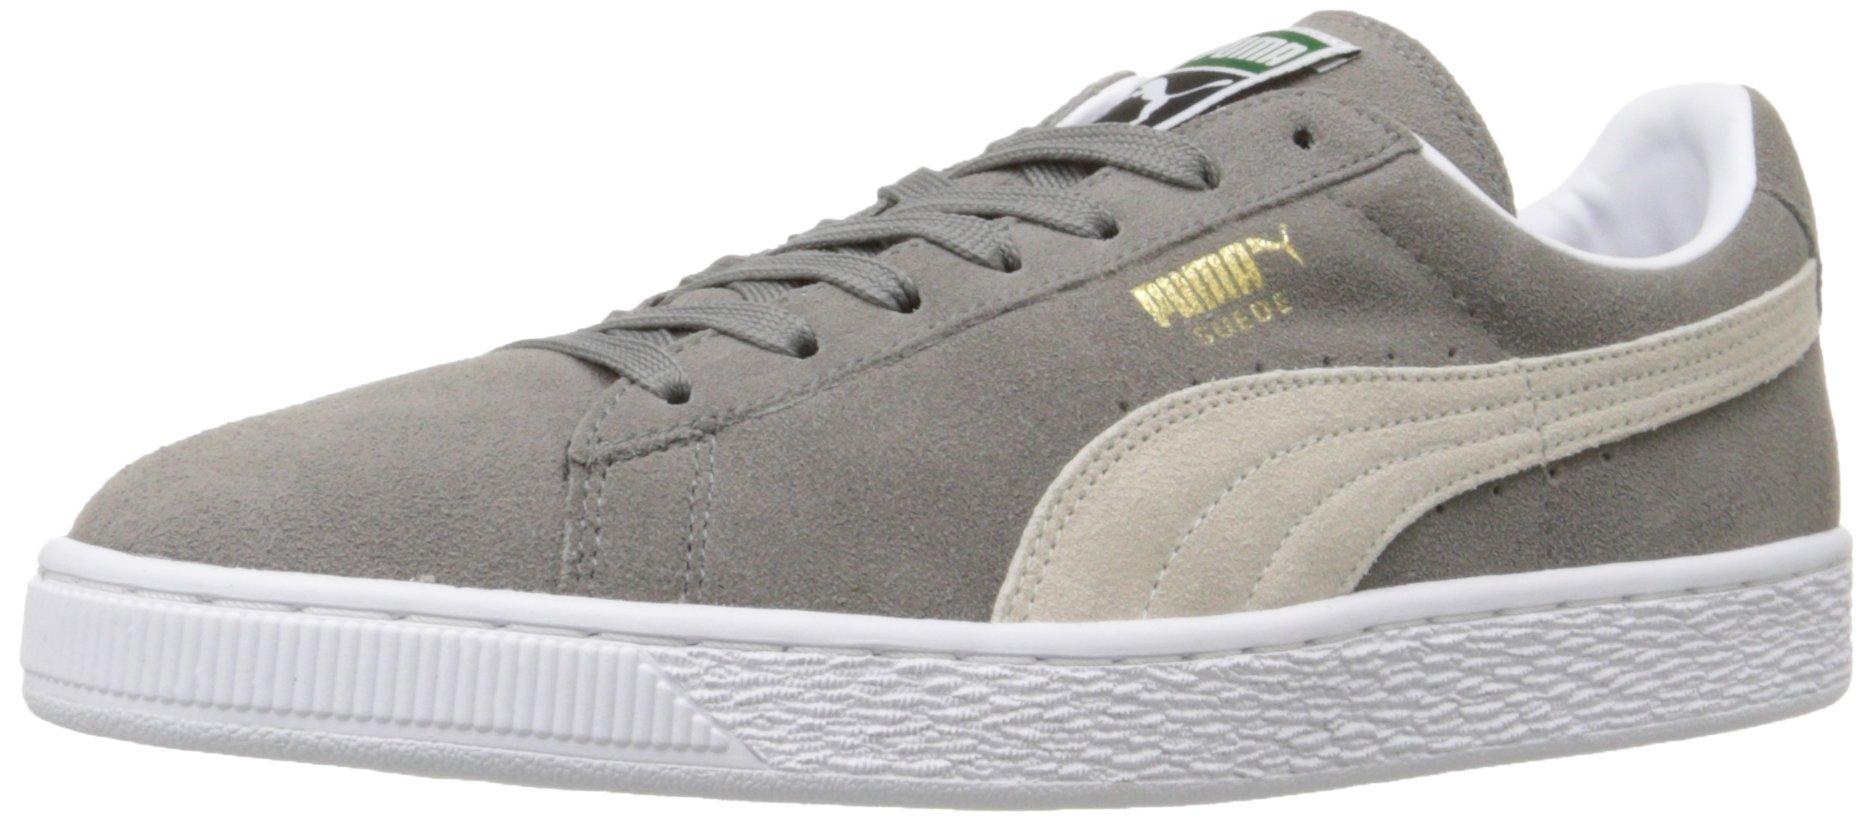 PUMA Suede Classic Sneaker,Steeple Gray/White,13 M US Men's